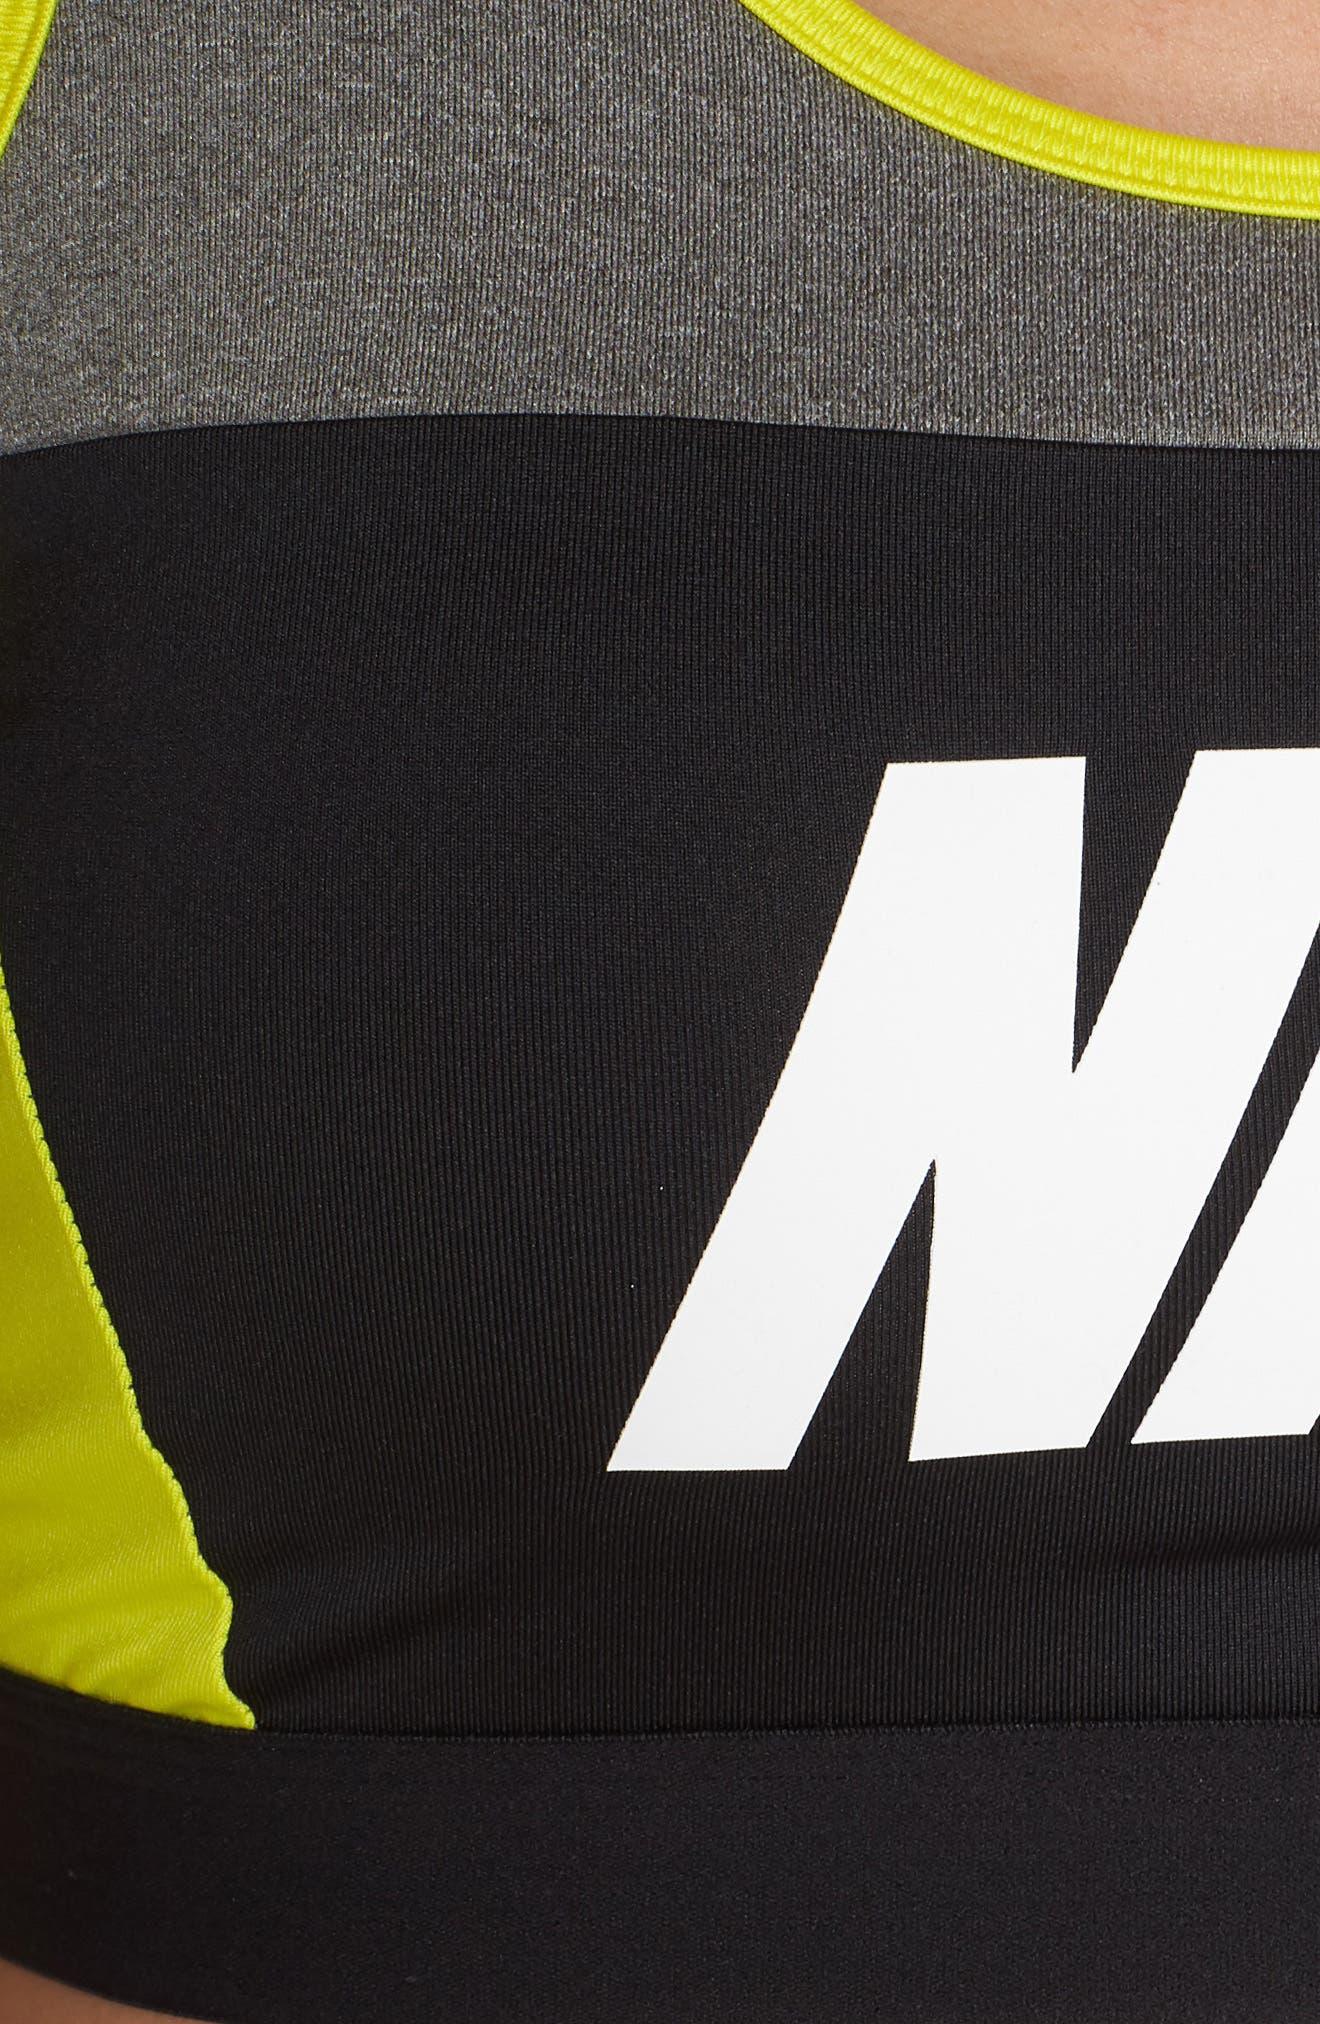 NIKE, Distort Dry Classic Sports Bra, Alternate thumbnail 6, color, 091